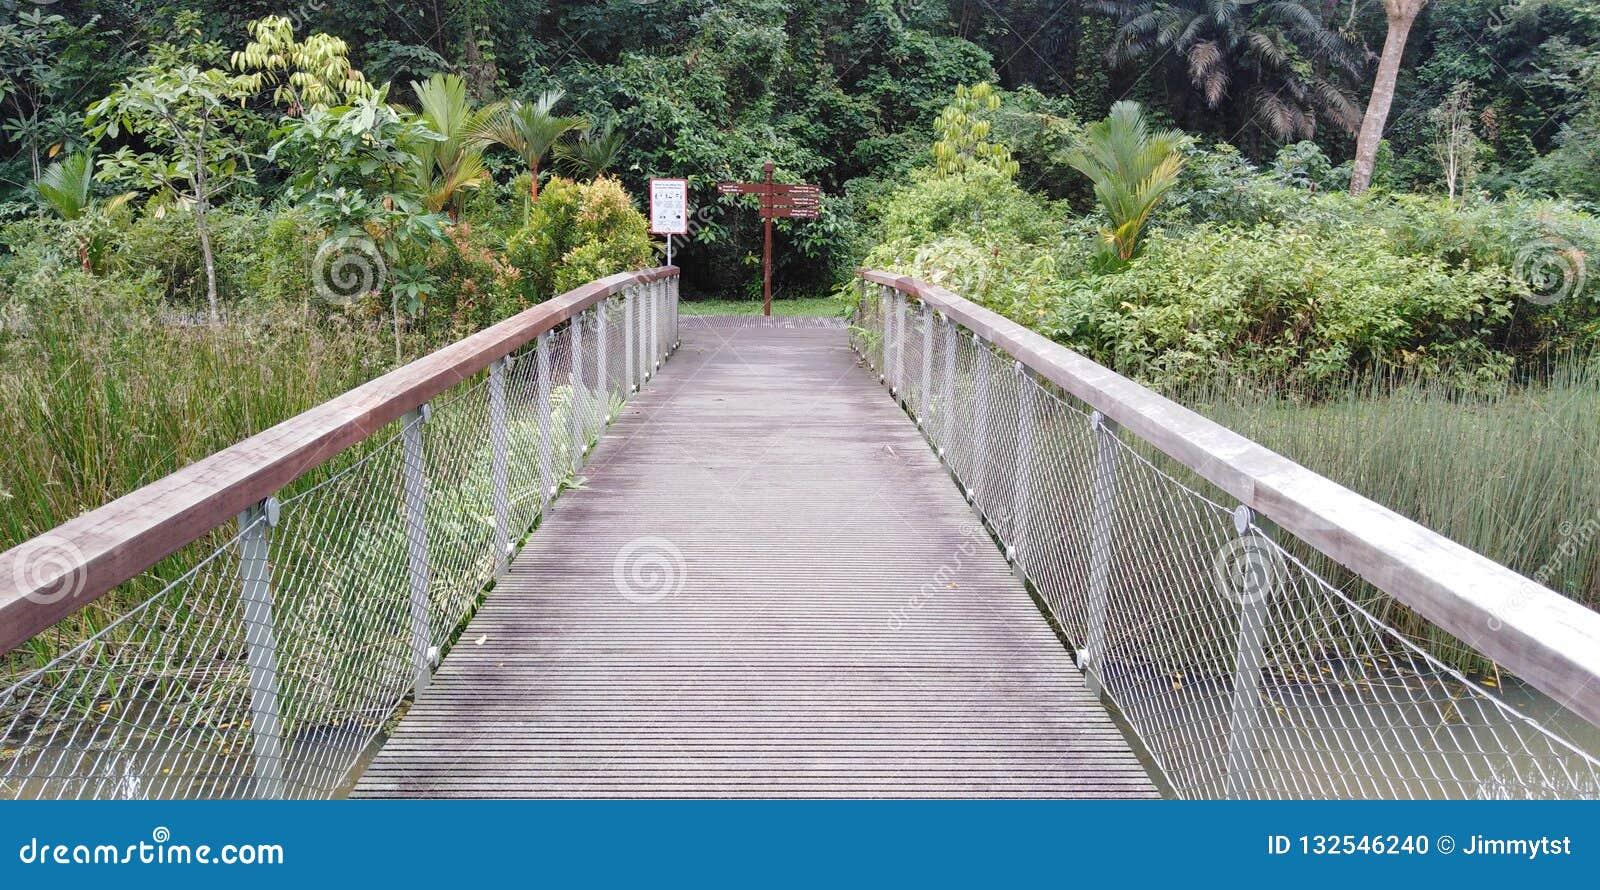 Windsor nature park stock photo. Image of river, bridge ...